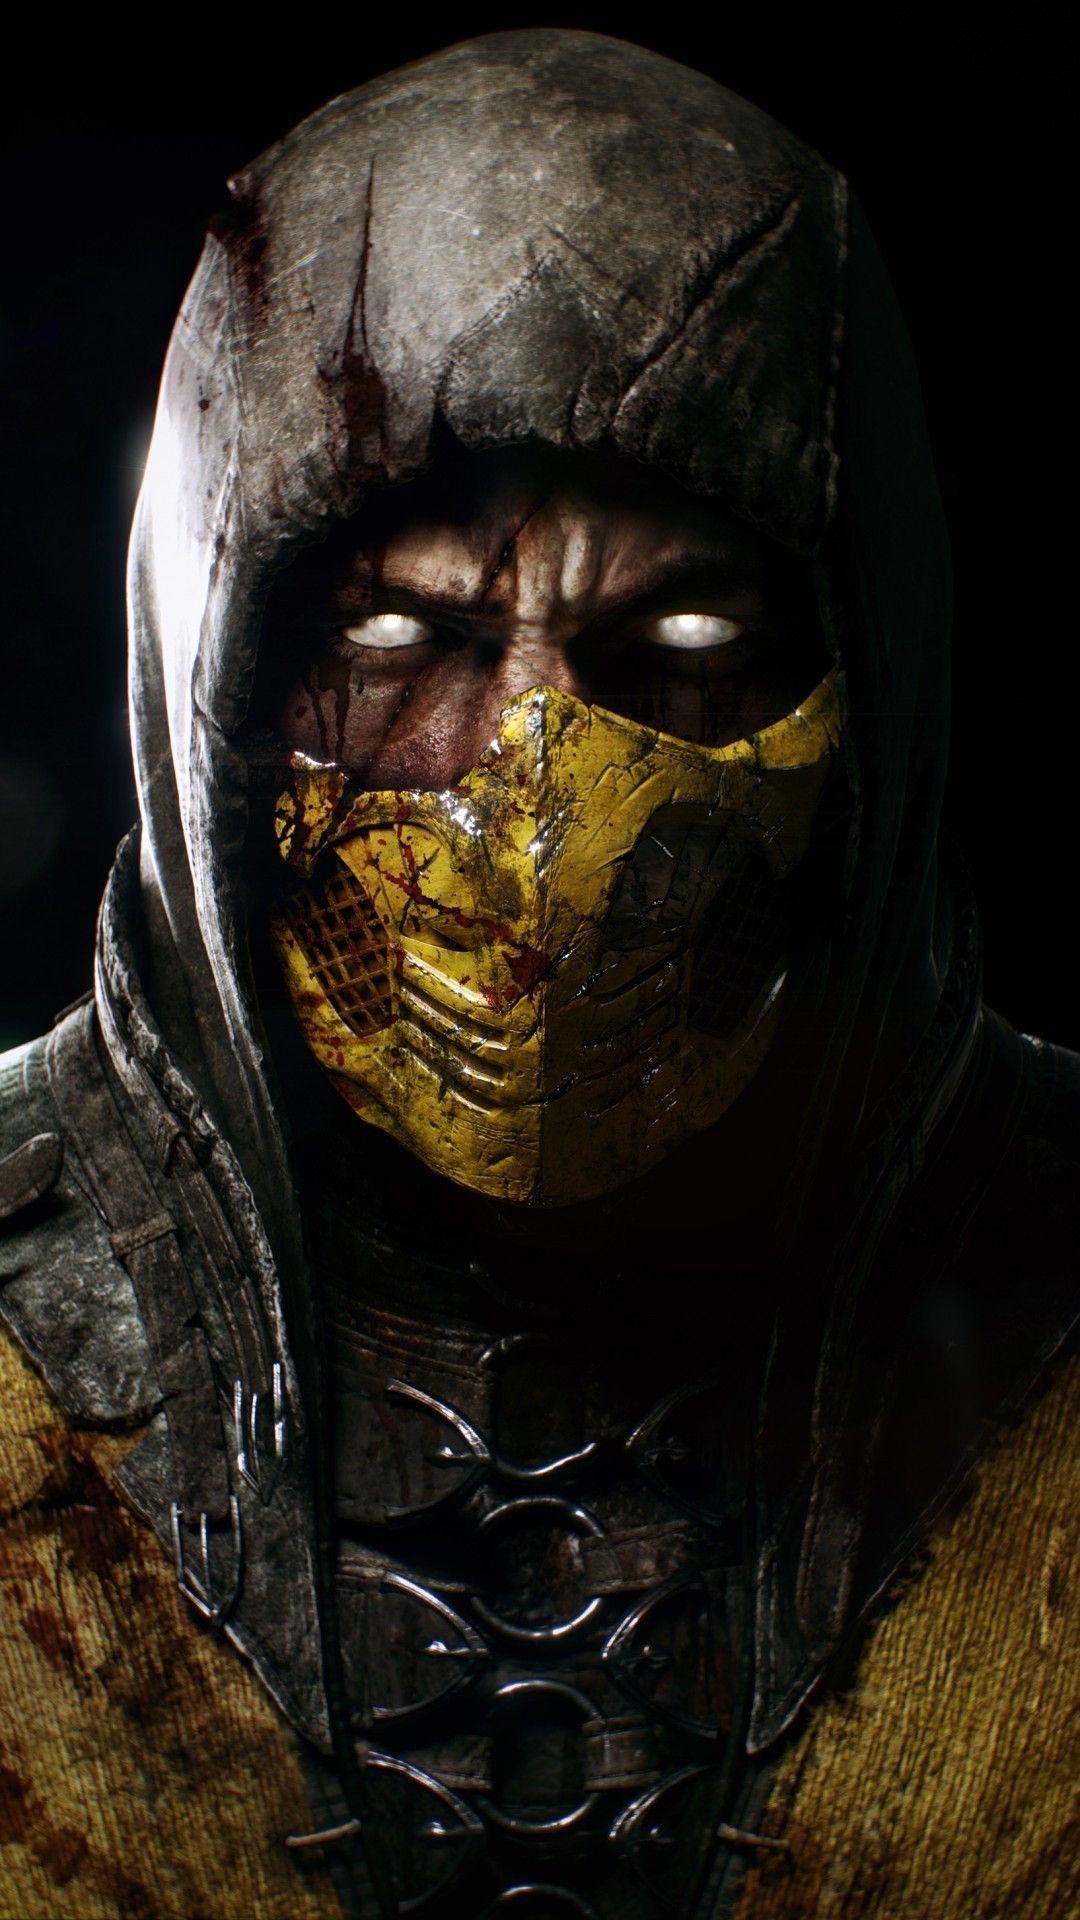 Mortal Kombat Scorpion Wallpapers Top Free Mortal Kombat